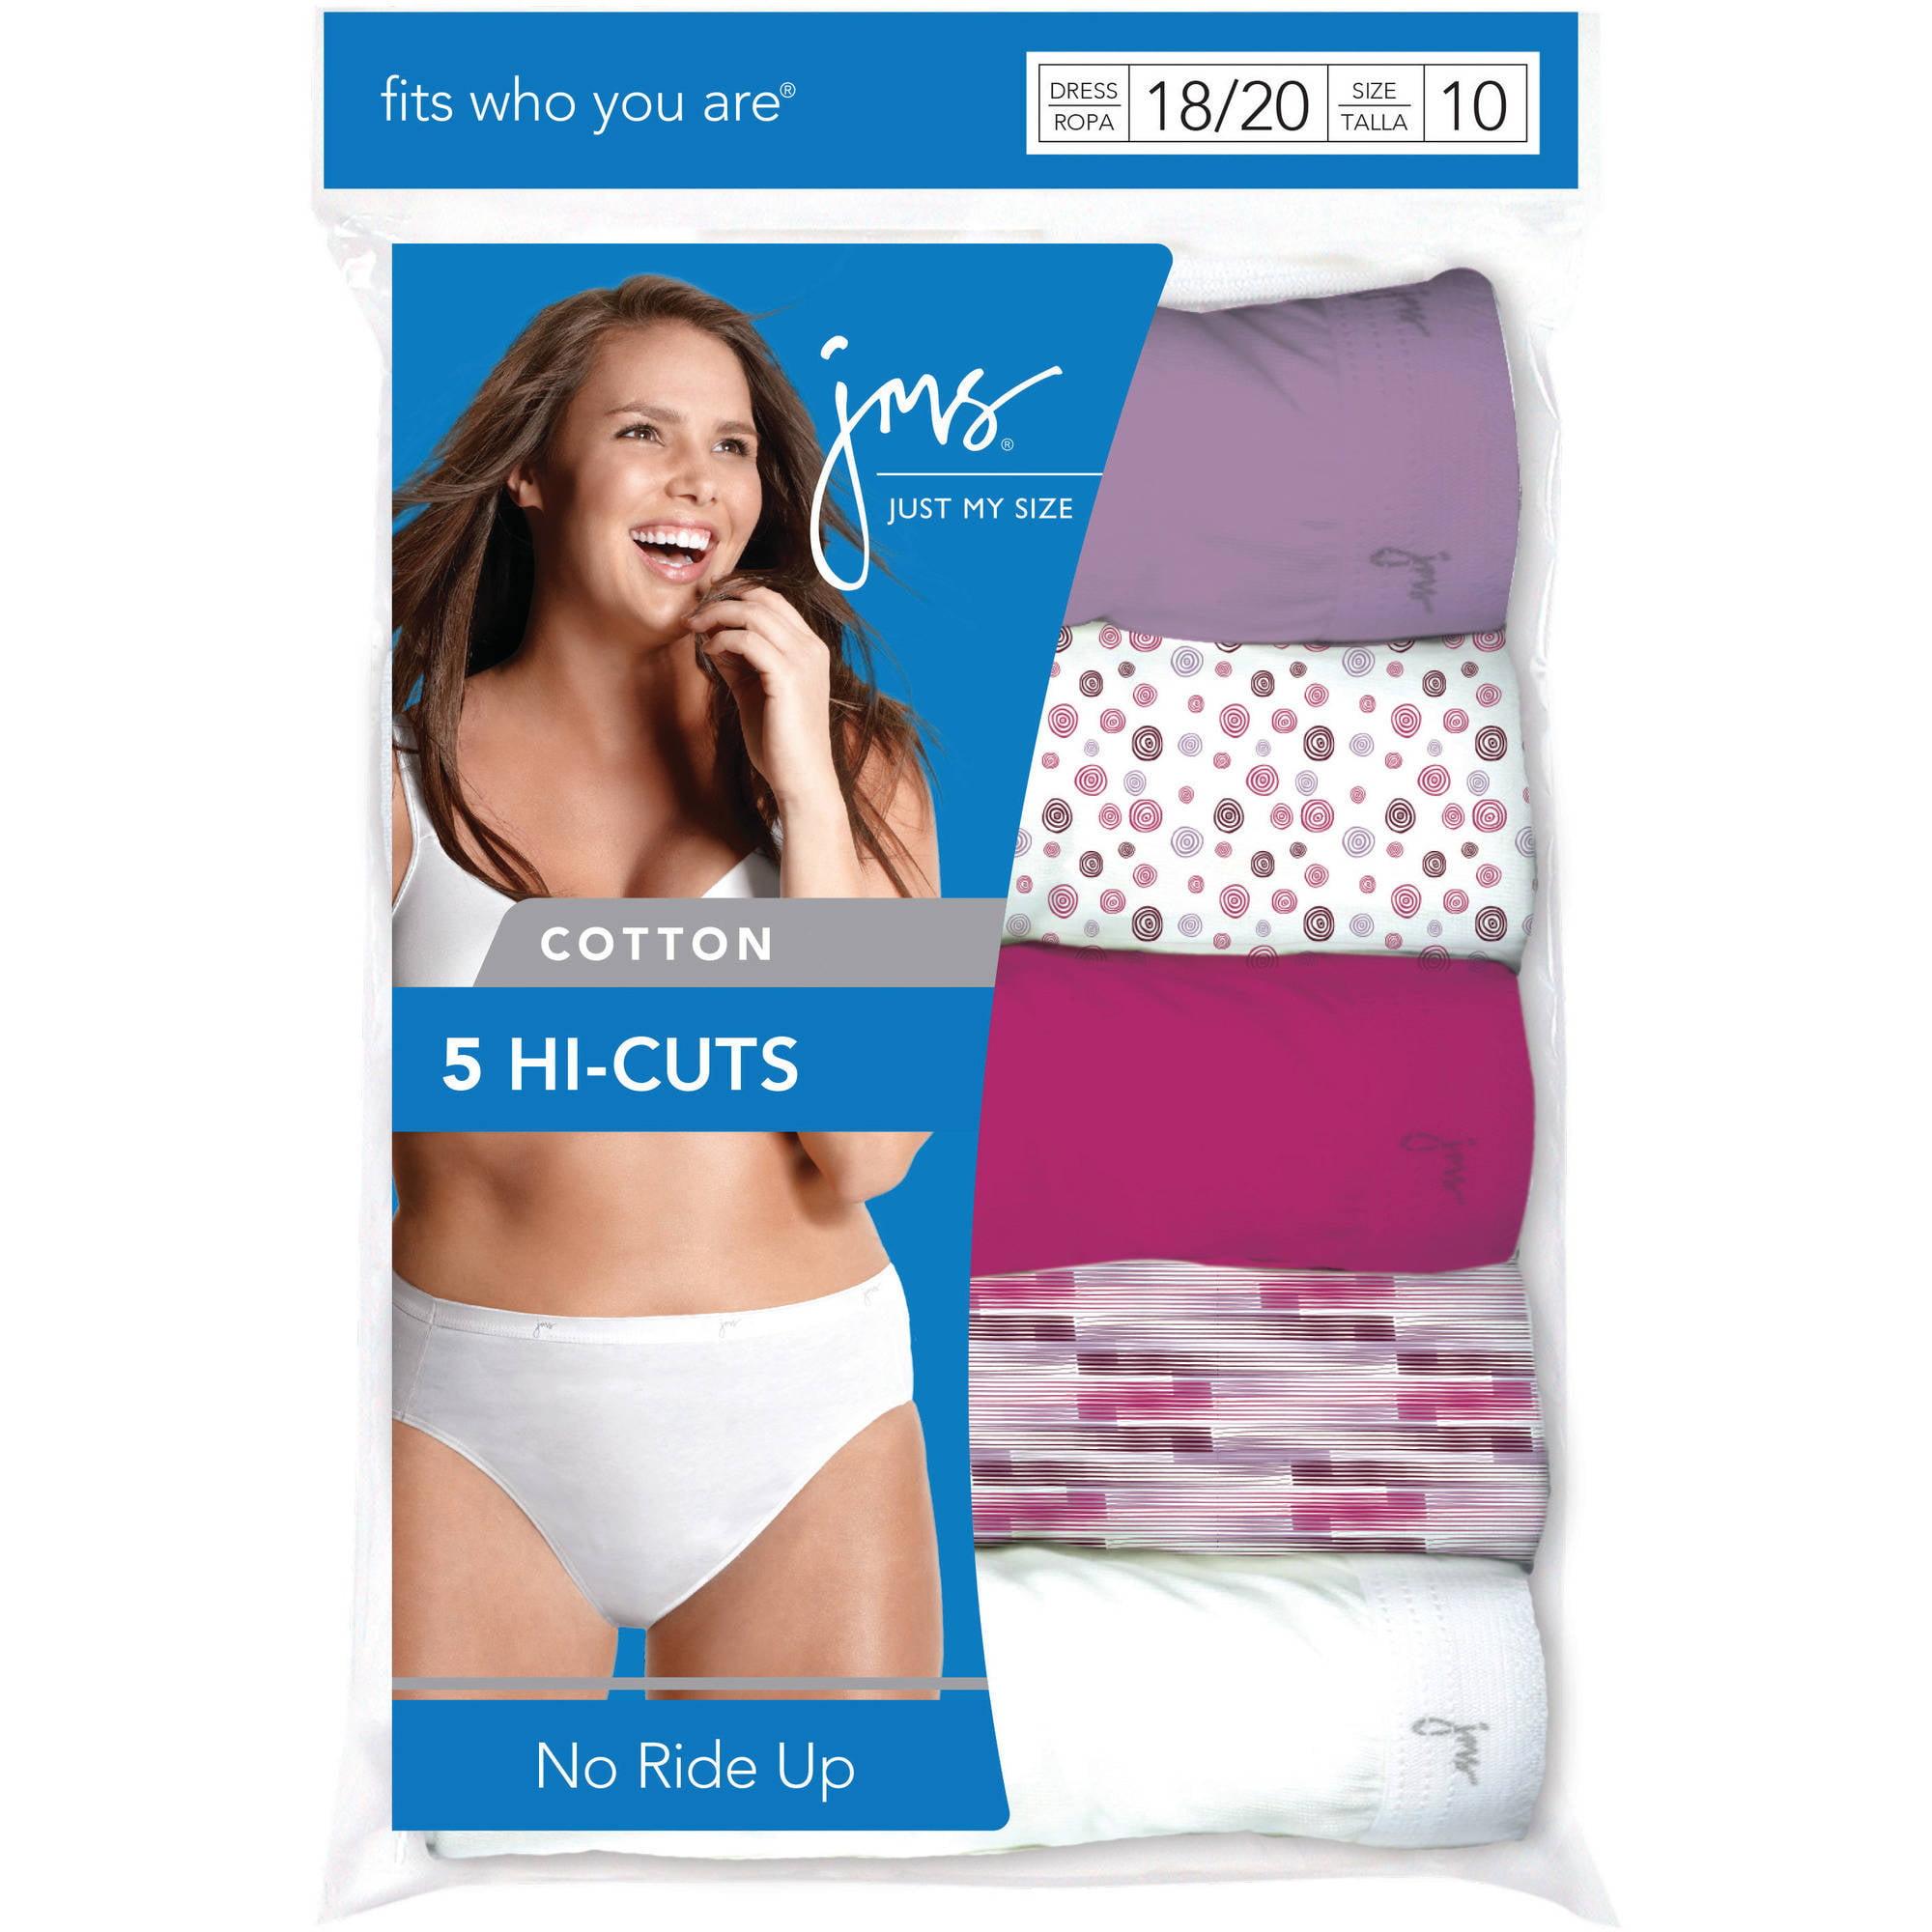 a6406dad2a Just My Size - Women s Cotton Tagless Hi-Cut Panties 5-Pack - Walmart.com